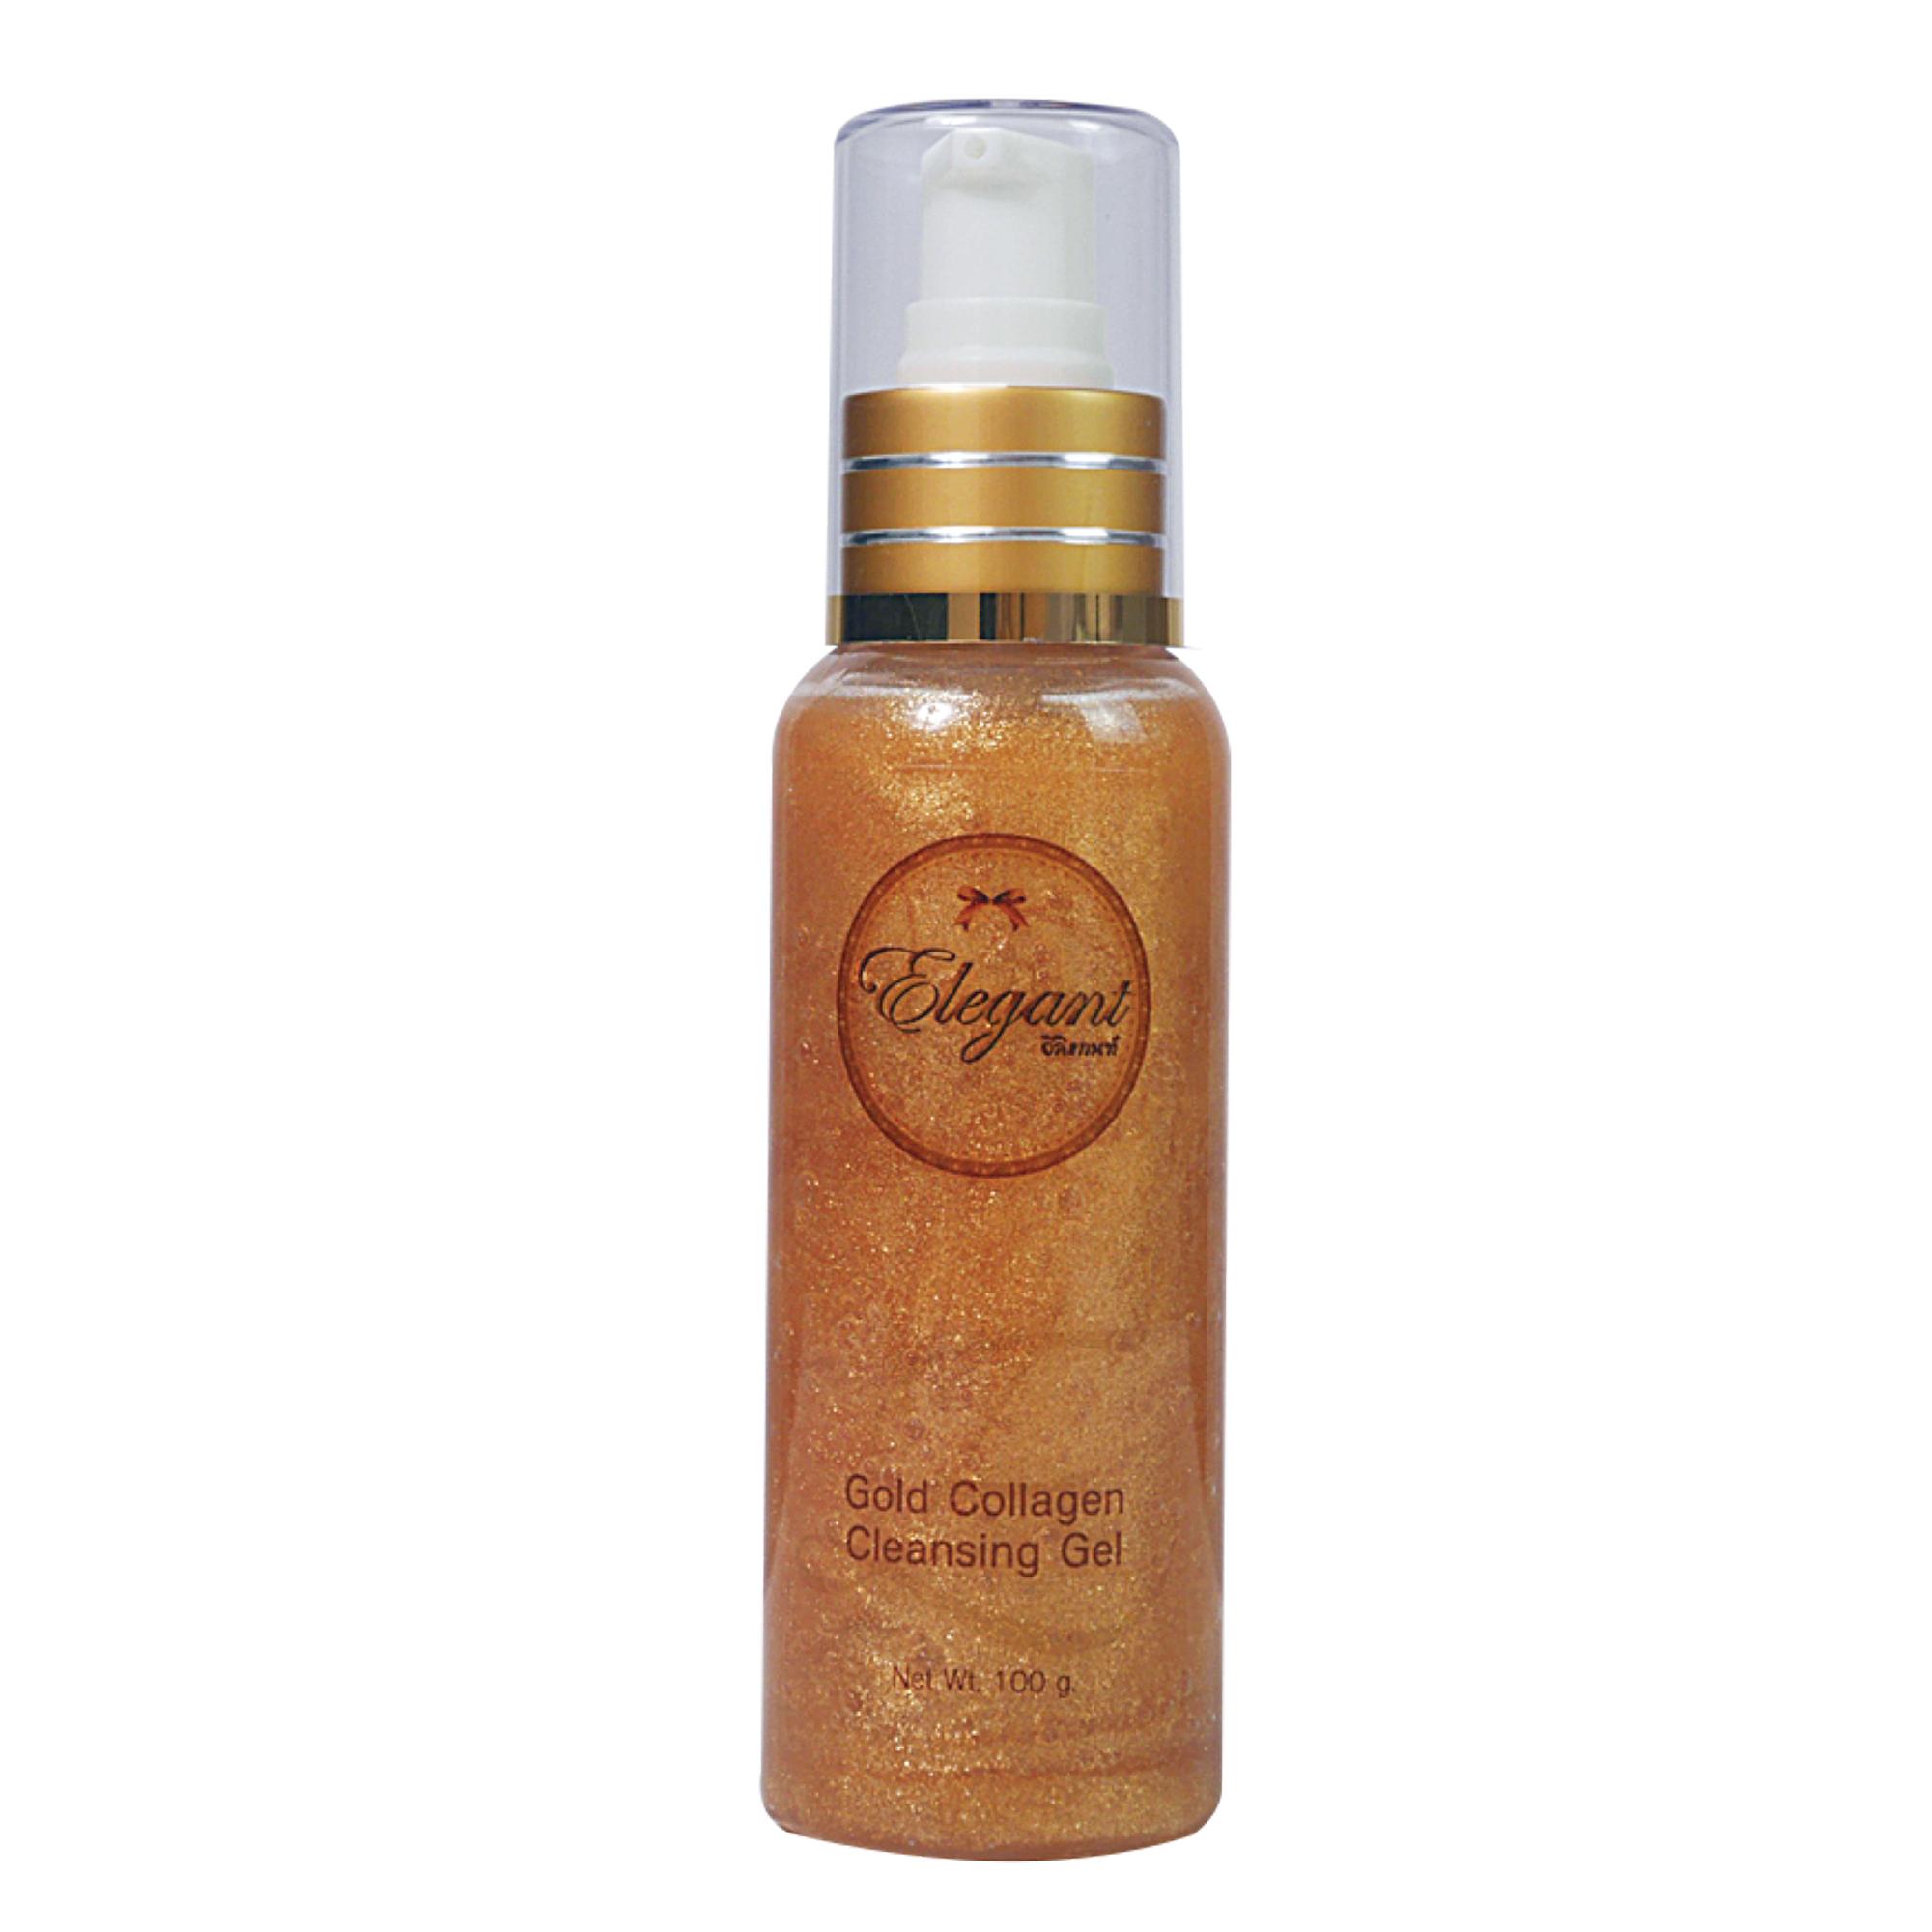 Elegant Gold Collagen Cleansing Gel 100 ml.